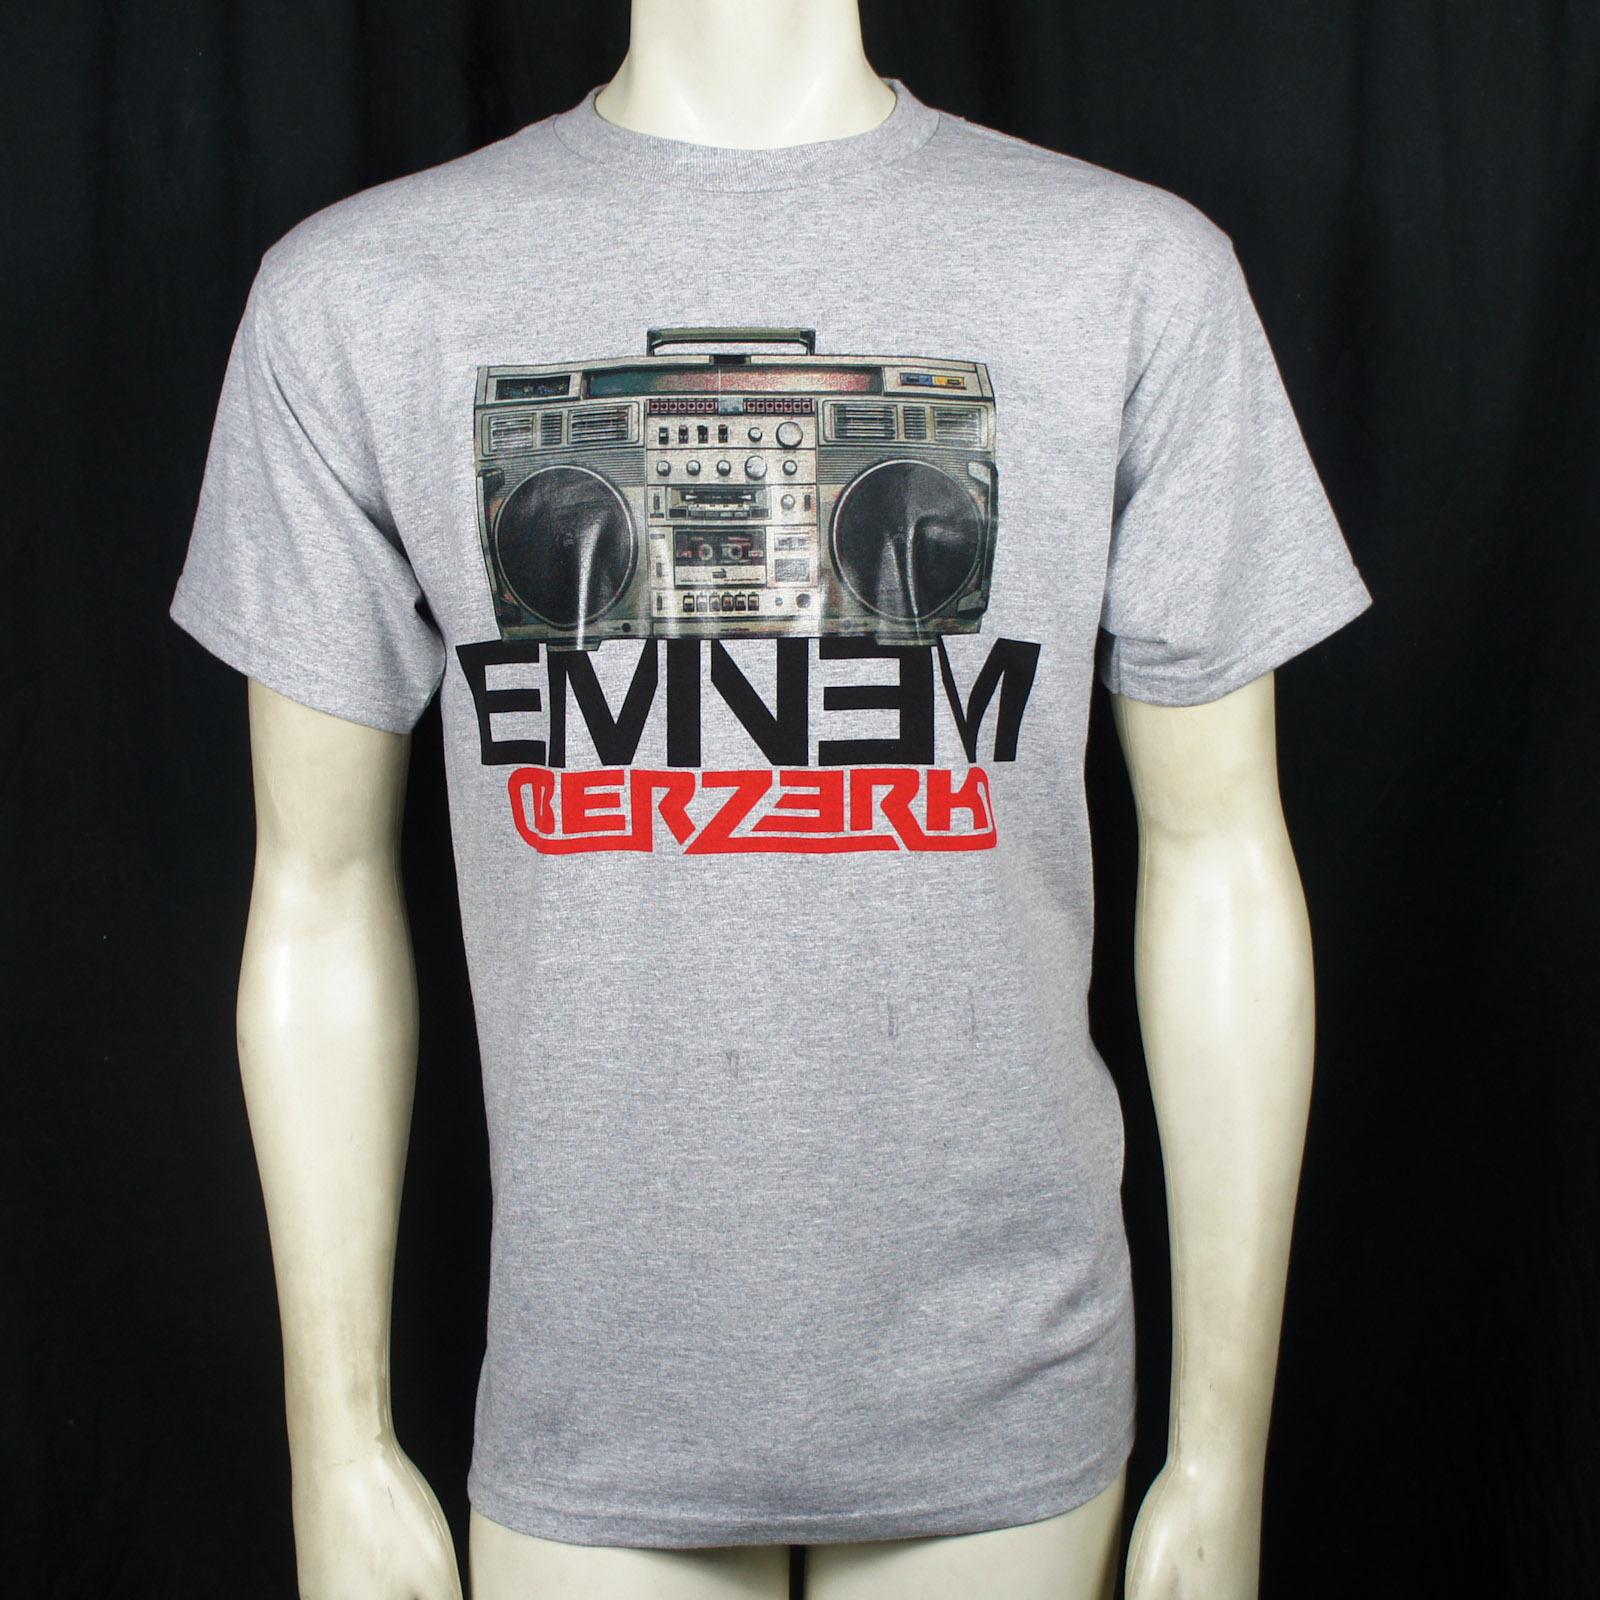 Quality T Shirts Printing Short Authentic Eminem Boombox Berzerk